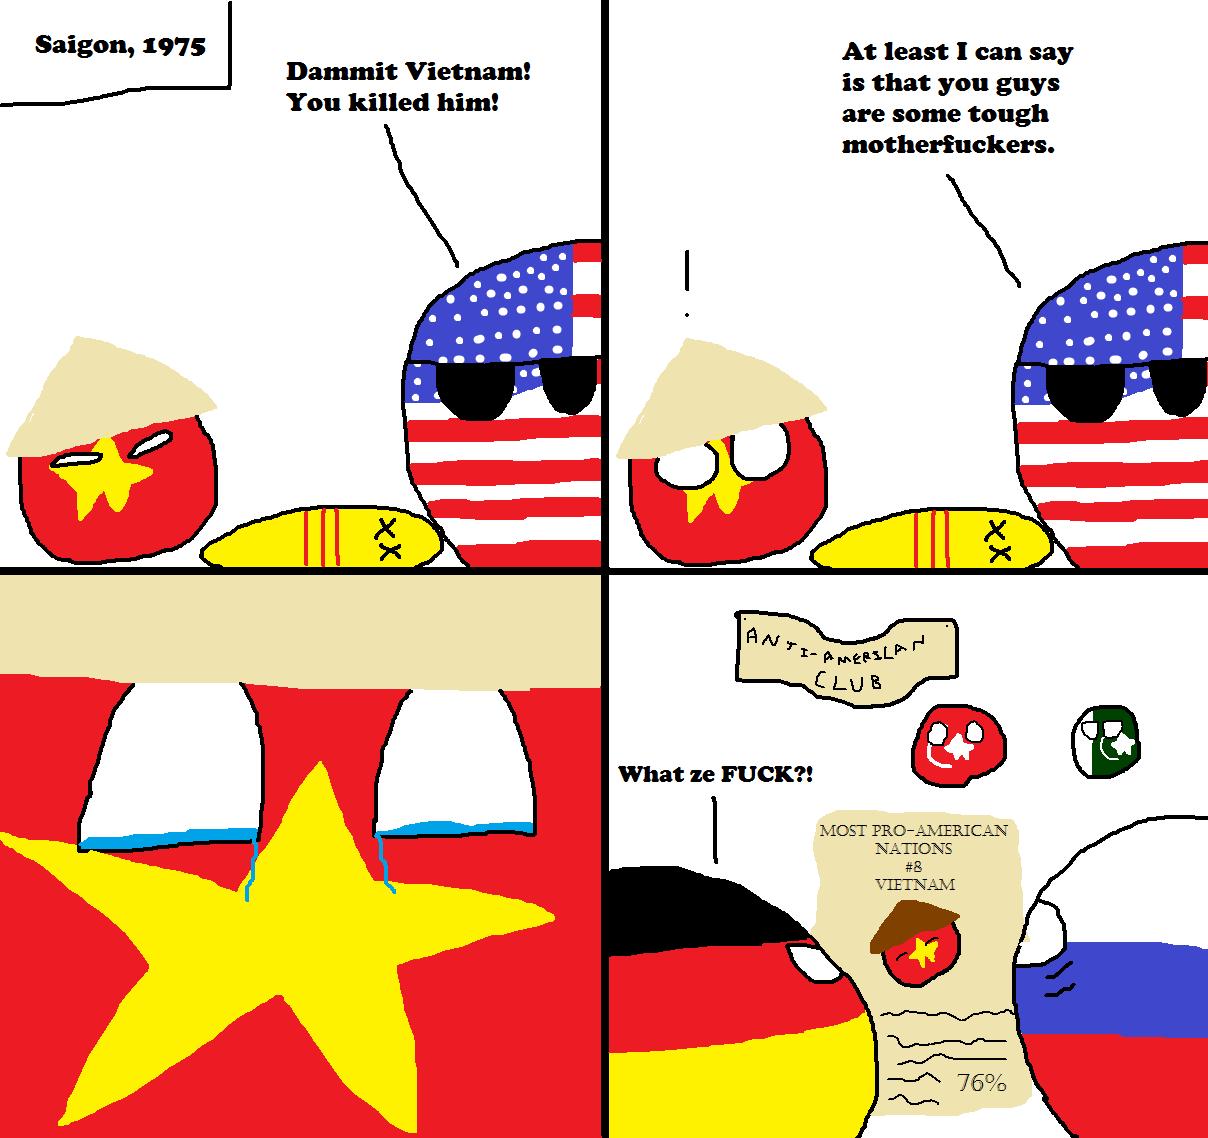 Nice fight, Vietnam